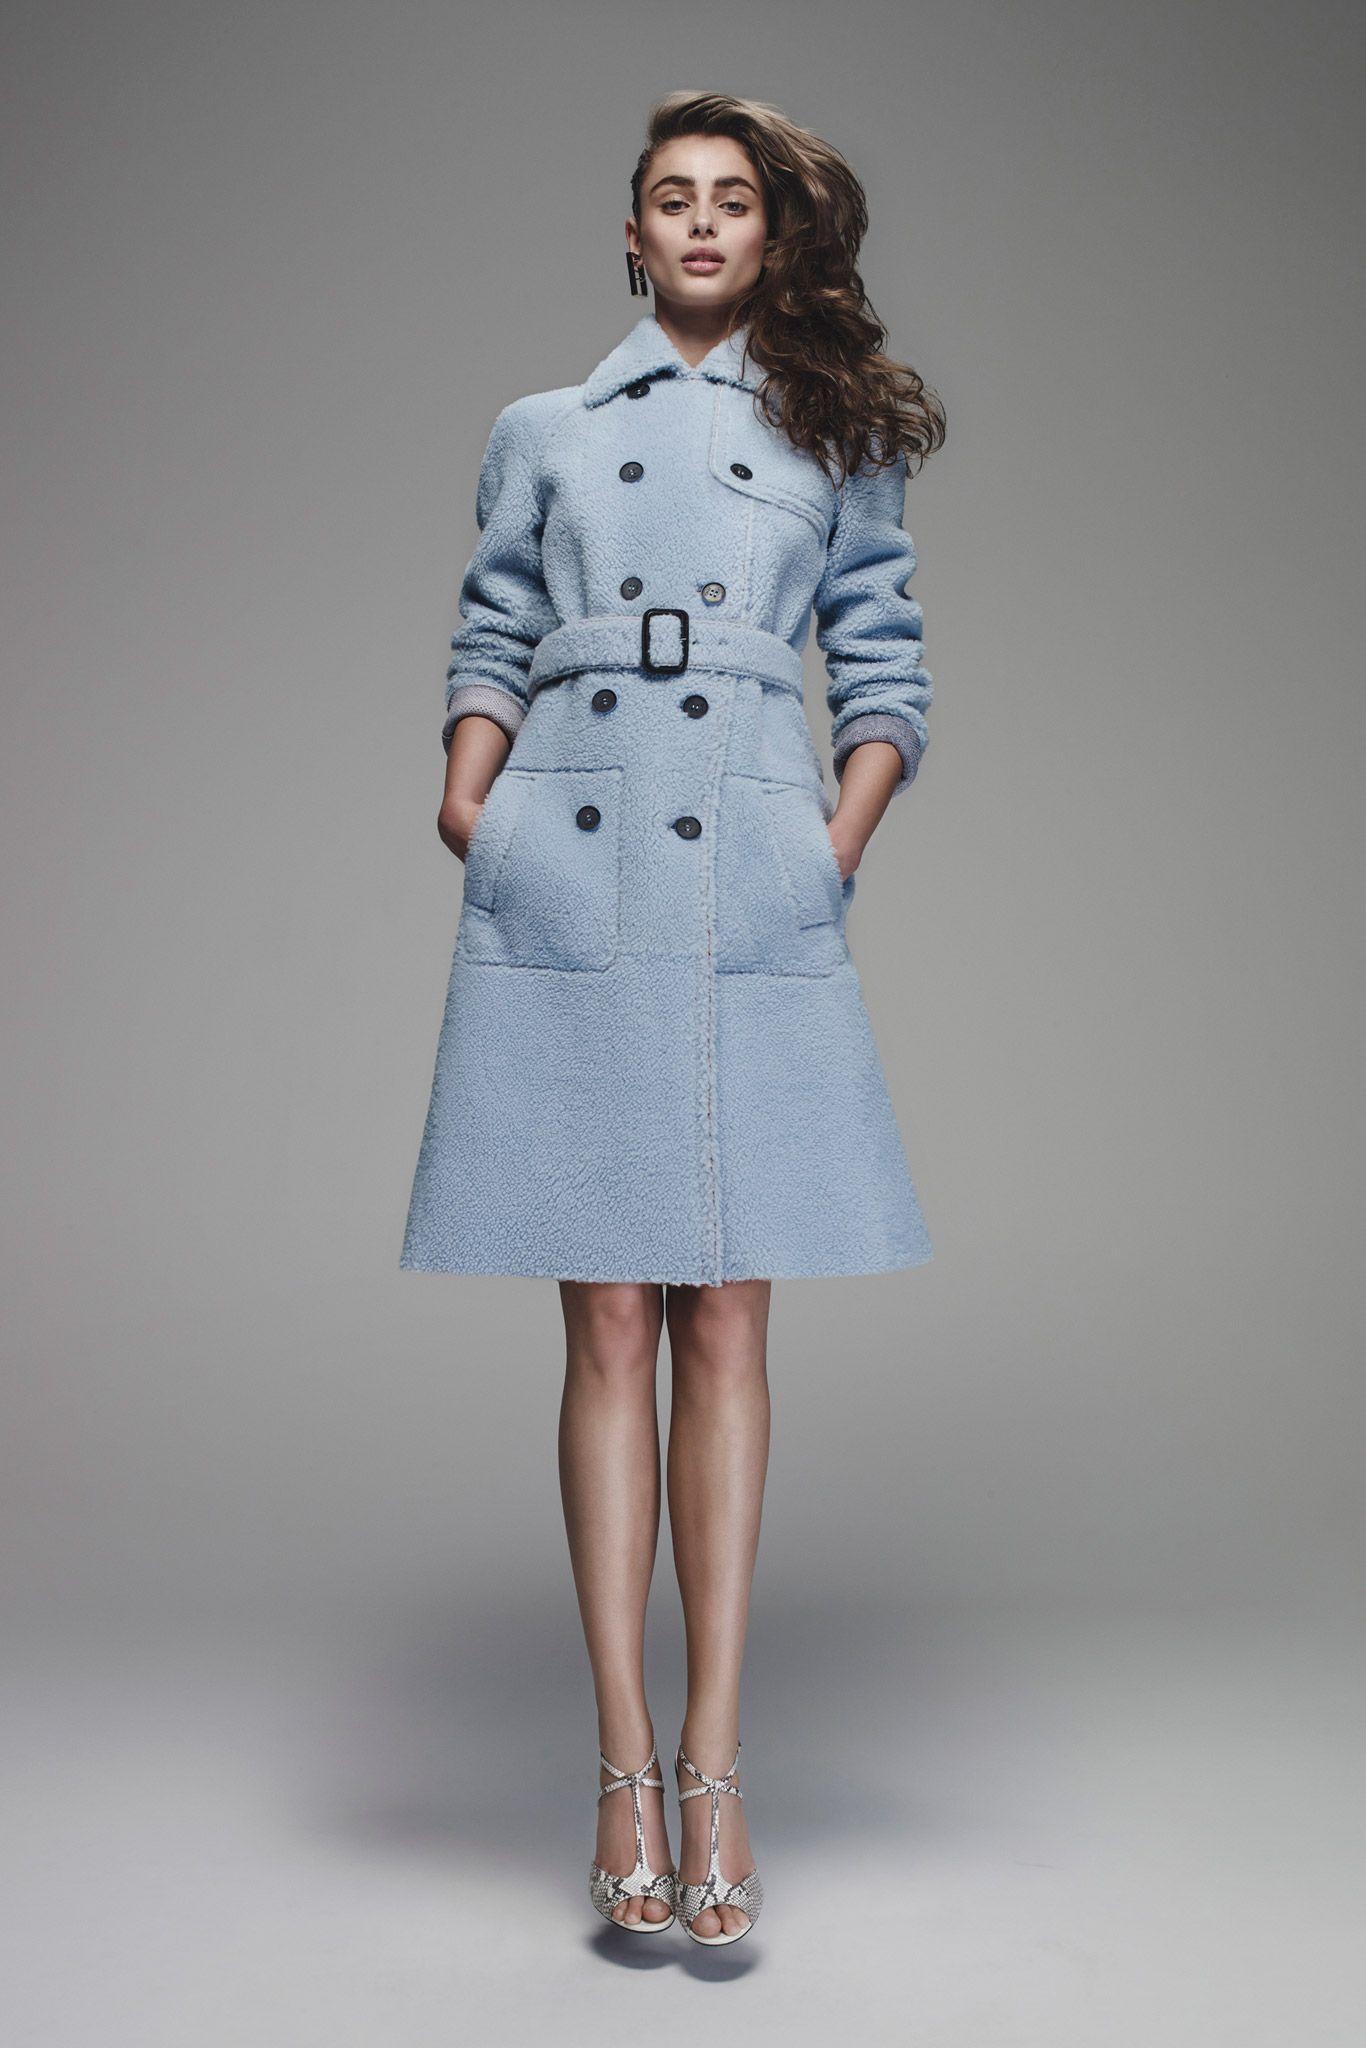 7c770f3c6b0b Fendi-Resort 2016 (look 16)   coat   Pinterest   Robe manteau ...